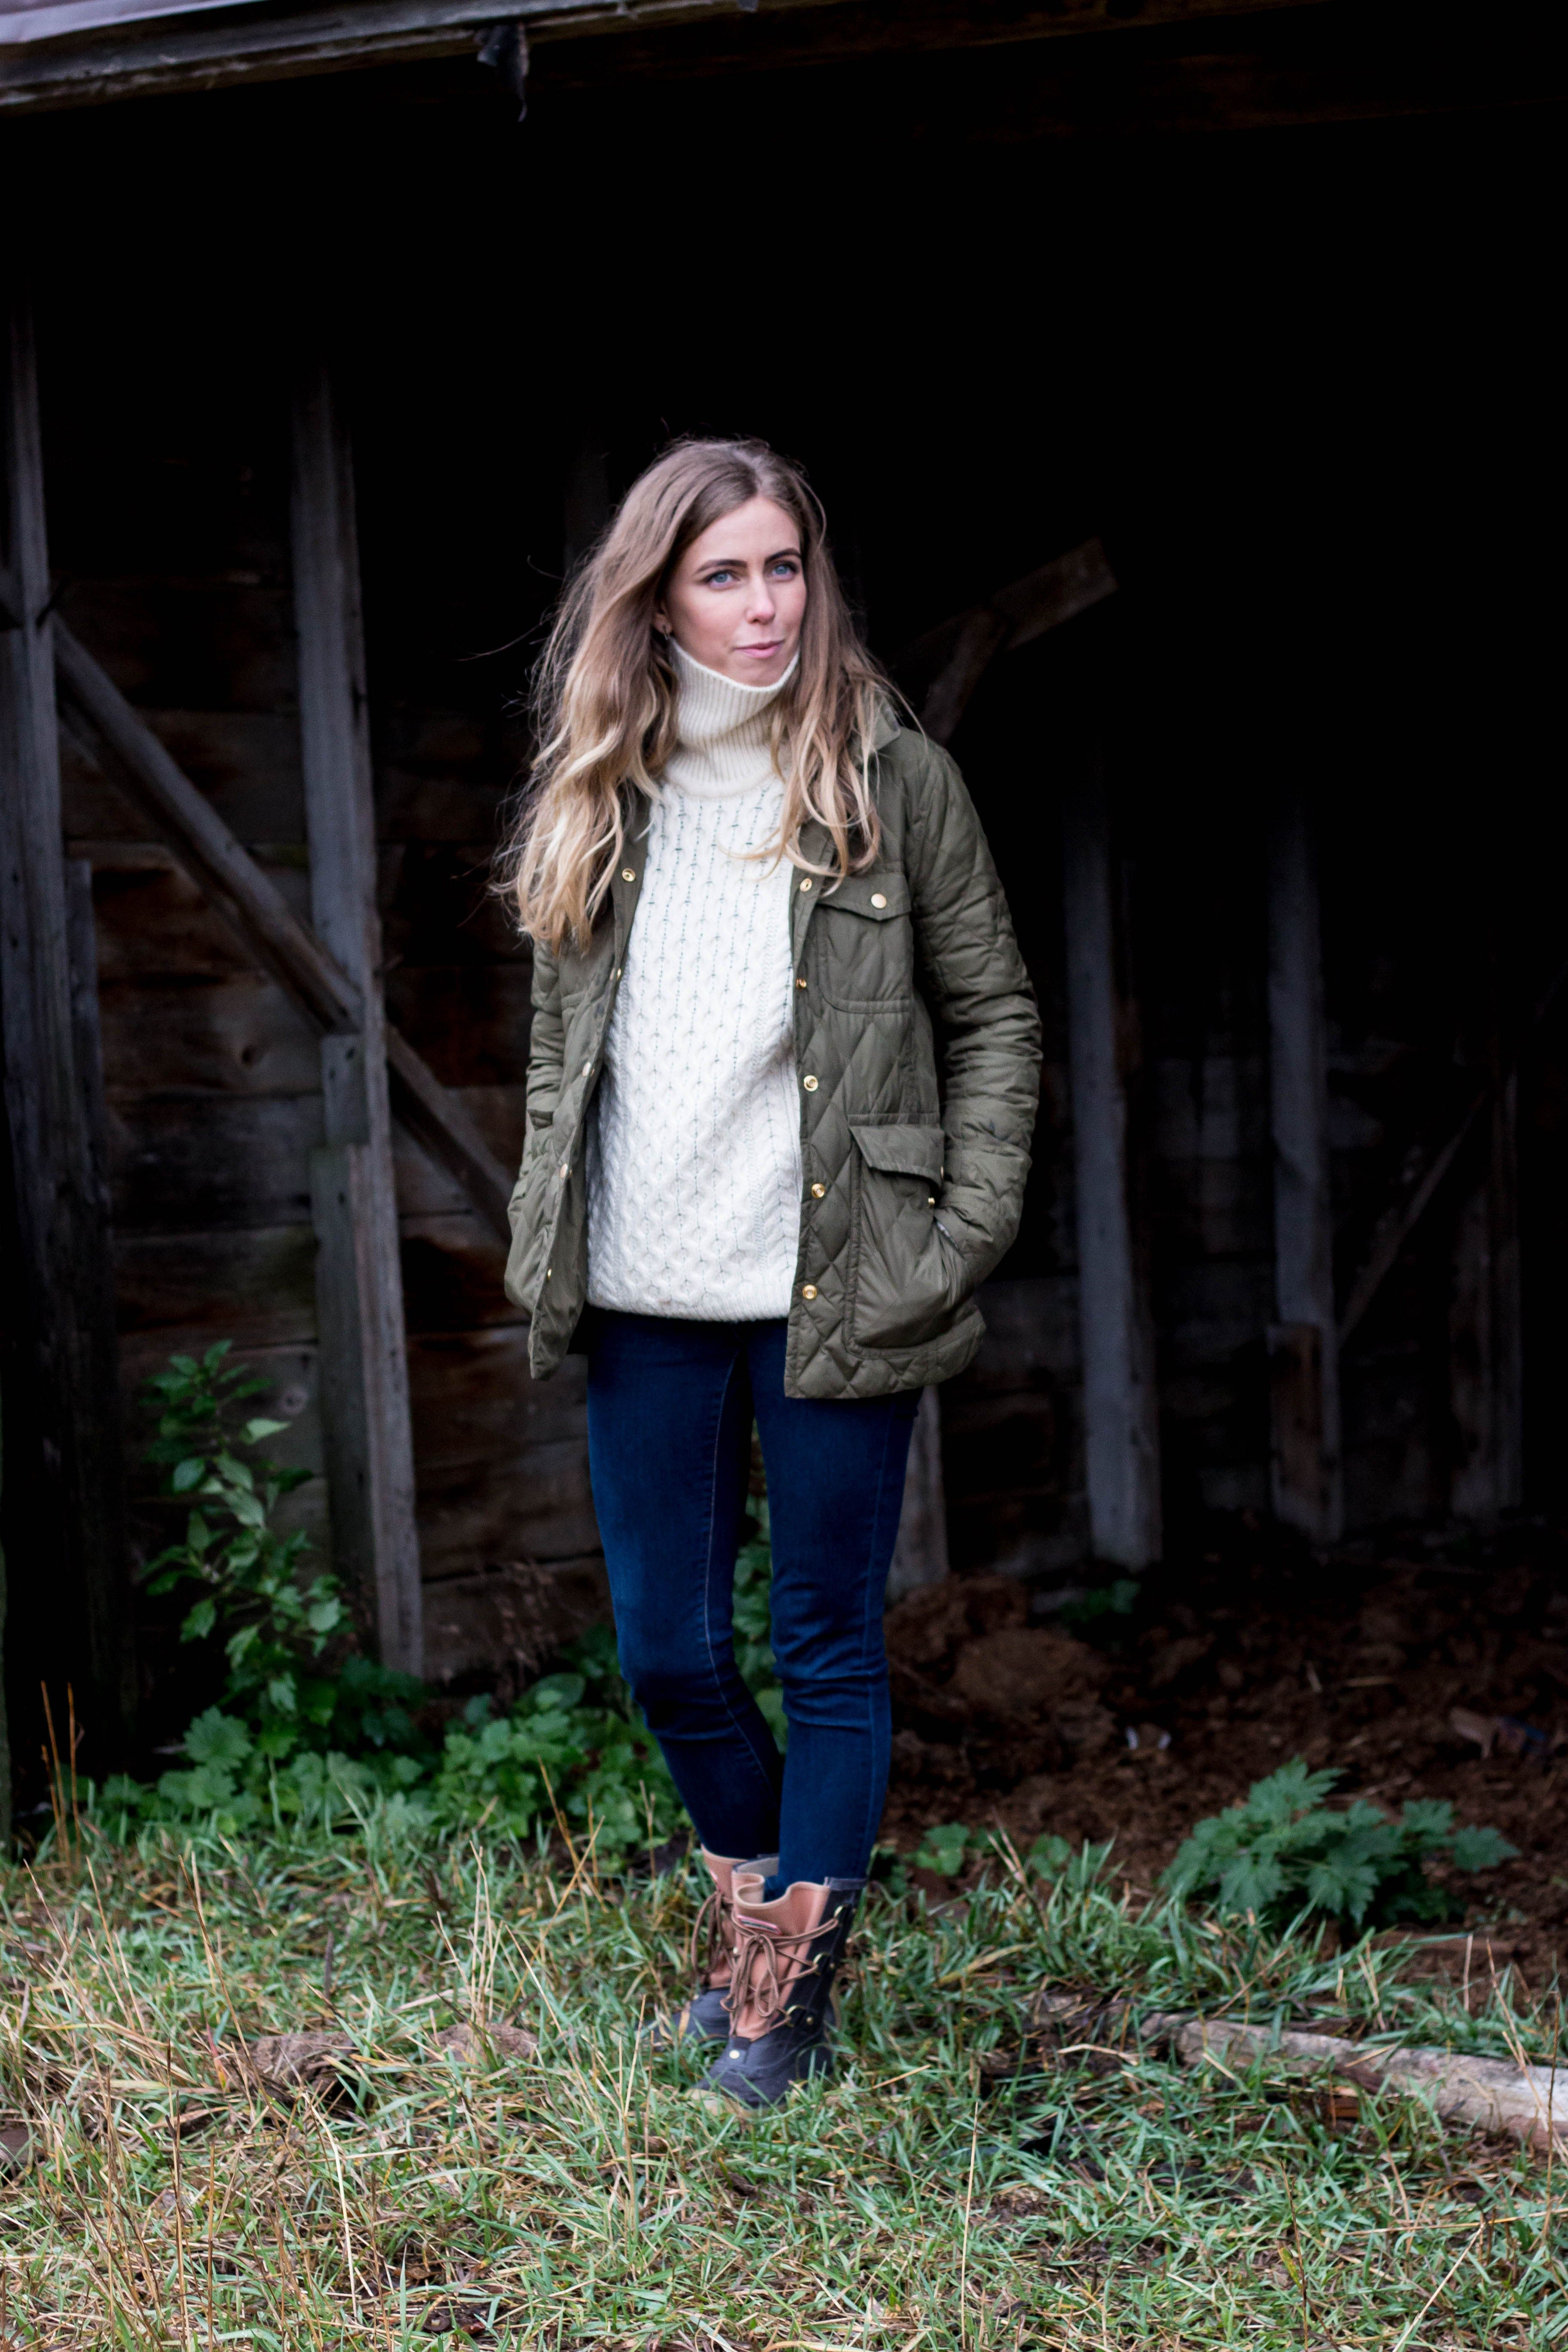 warm irish sweater, hunter boots